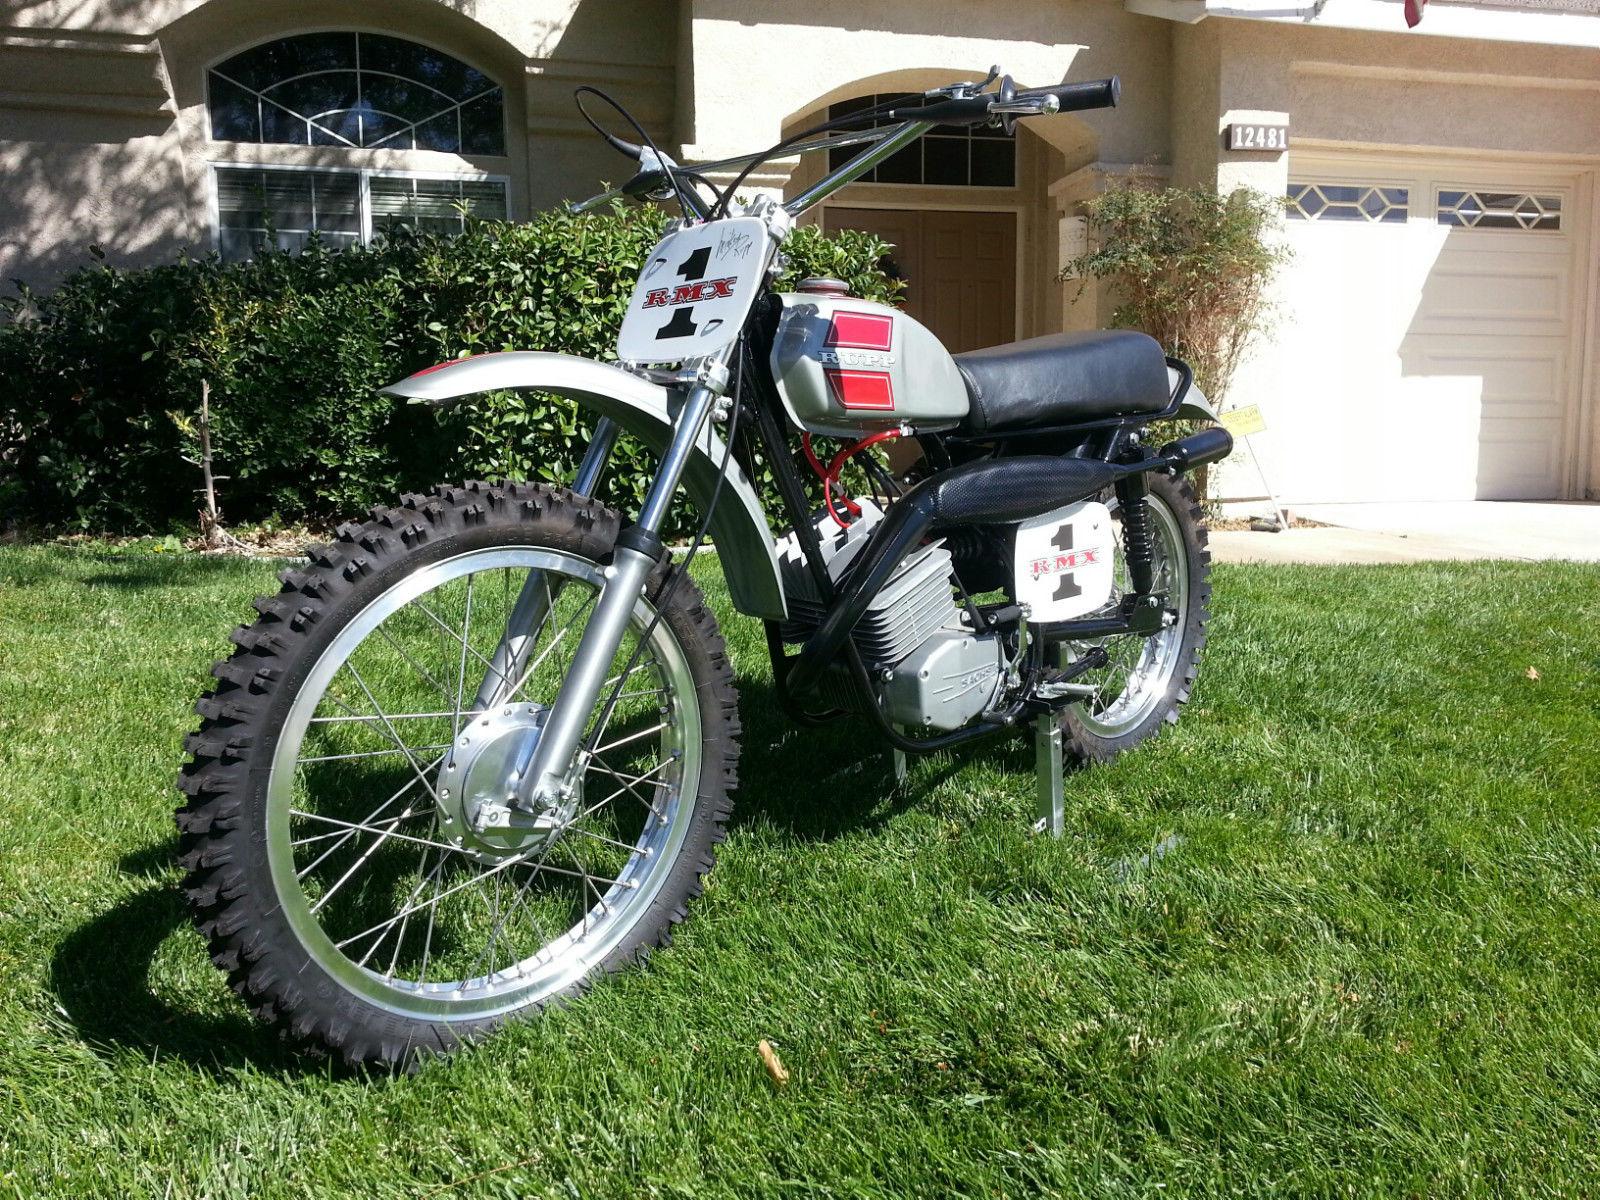 Rupp RMX125 - 1975